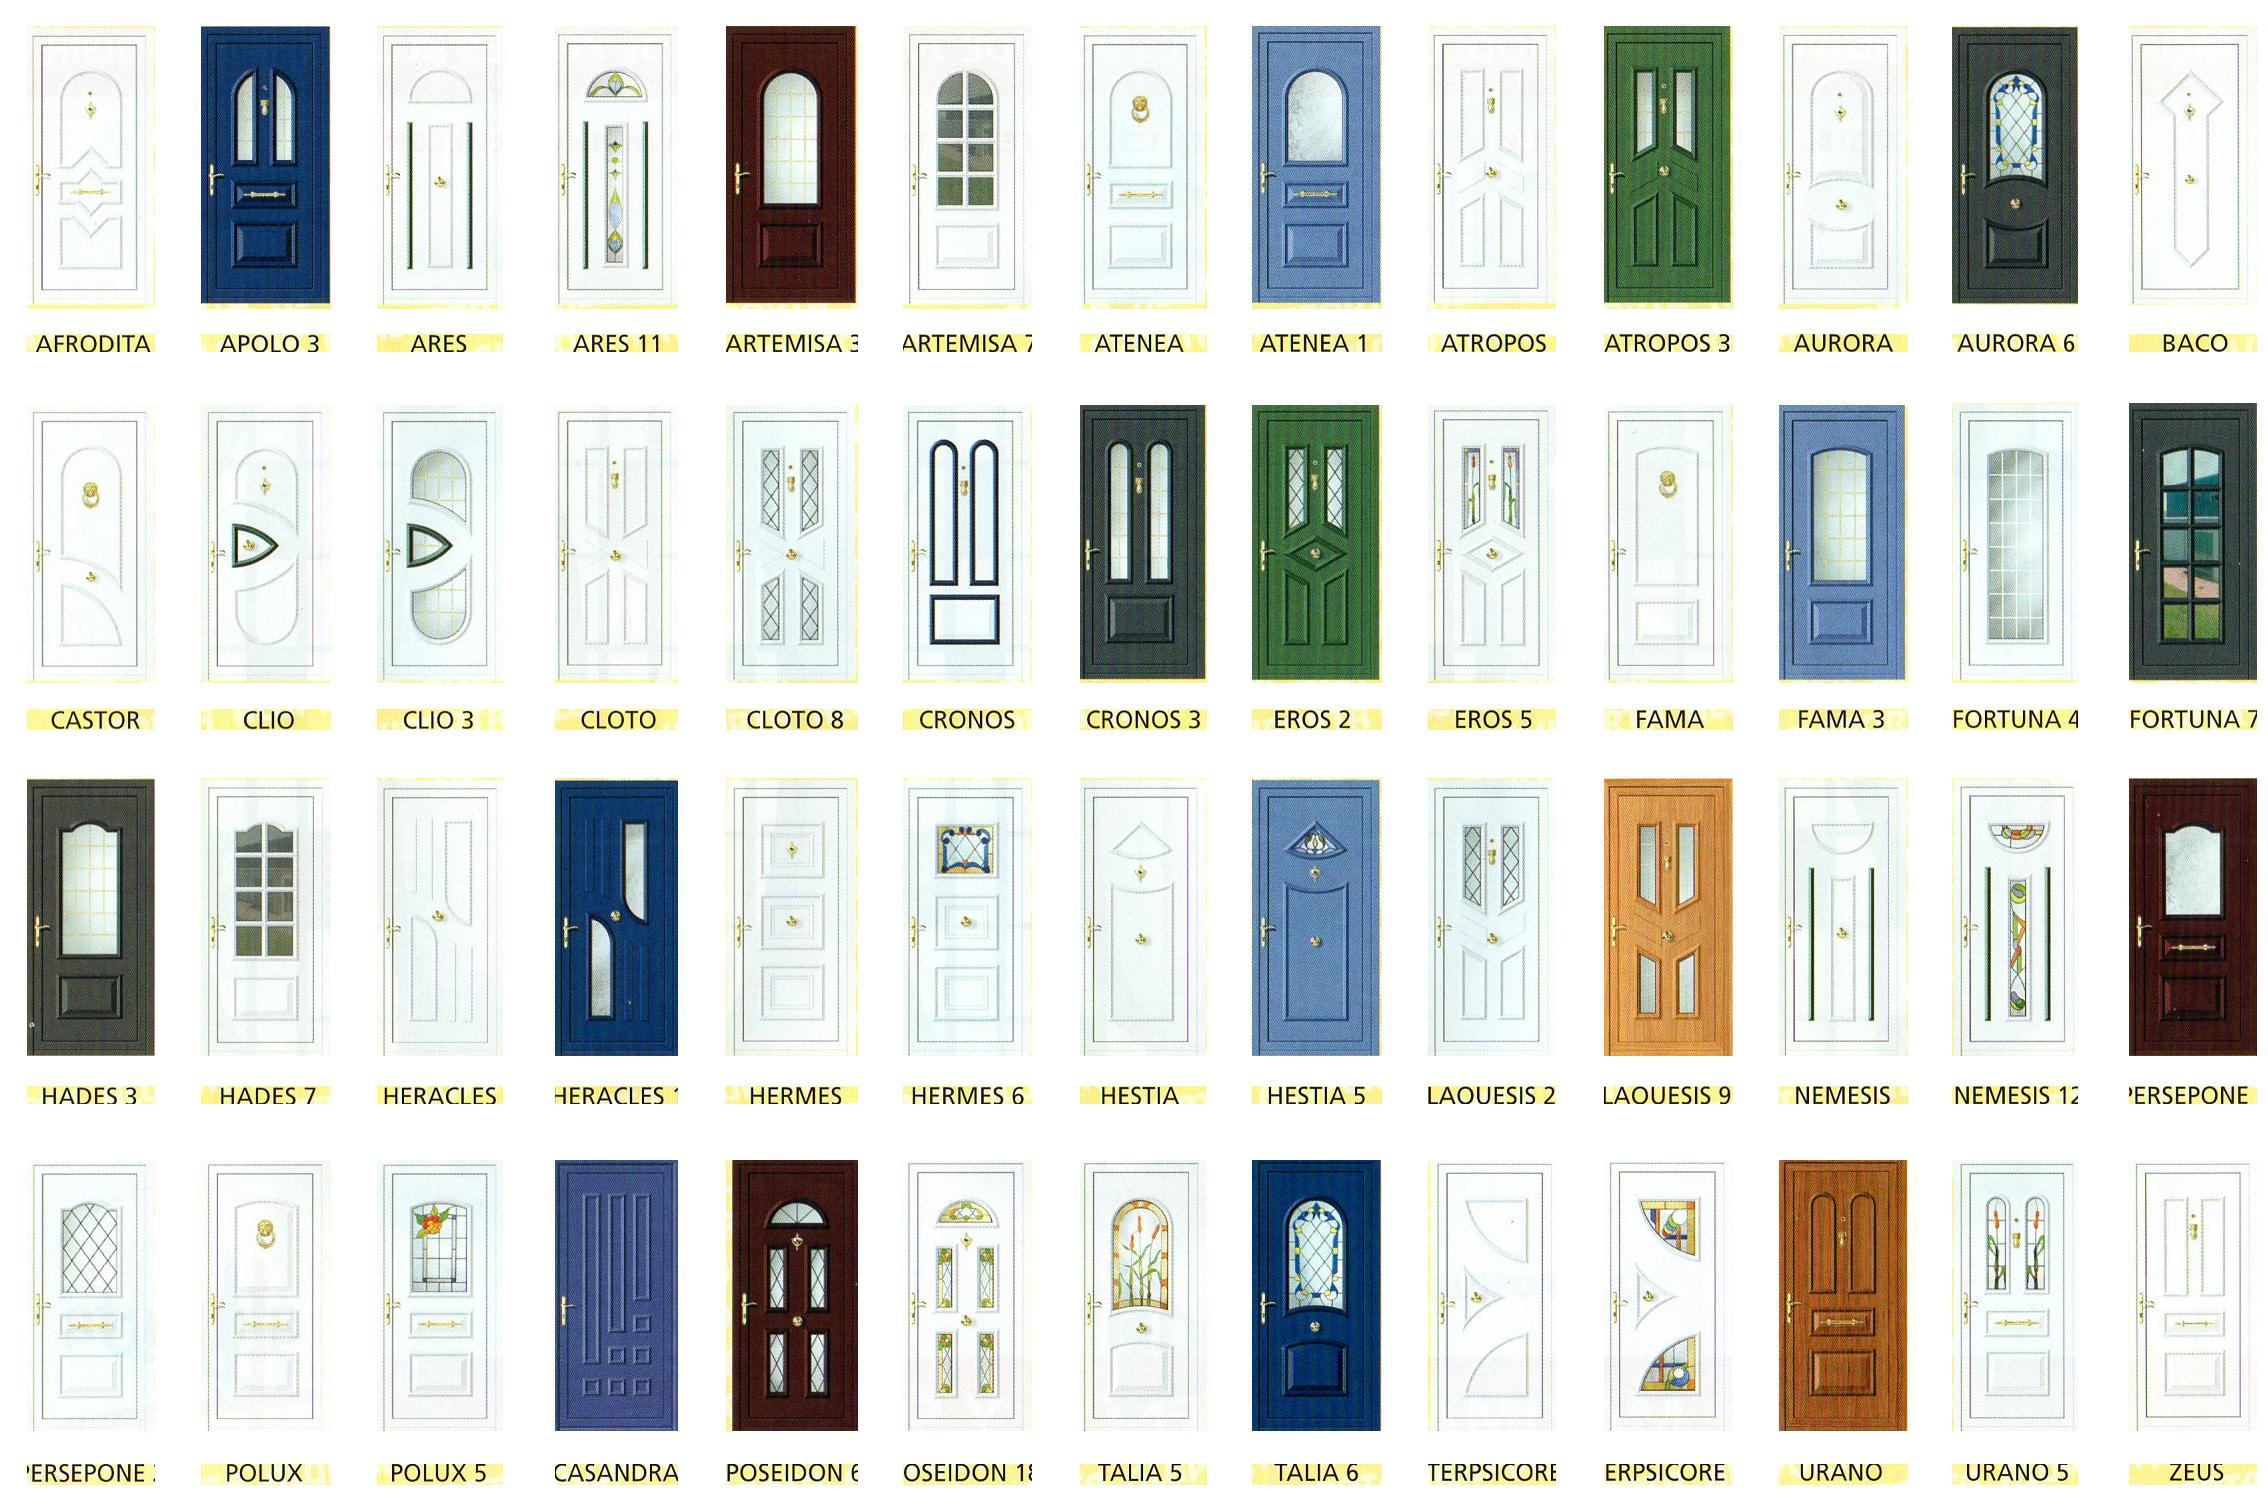 Catalogo de puertas imagui for Catalogo puertas metalicas